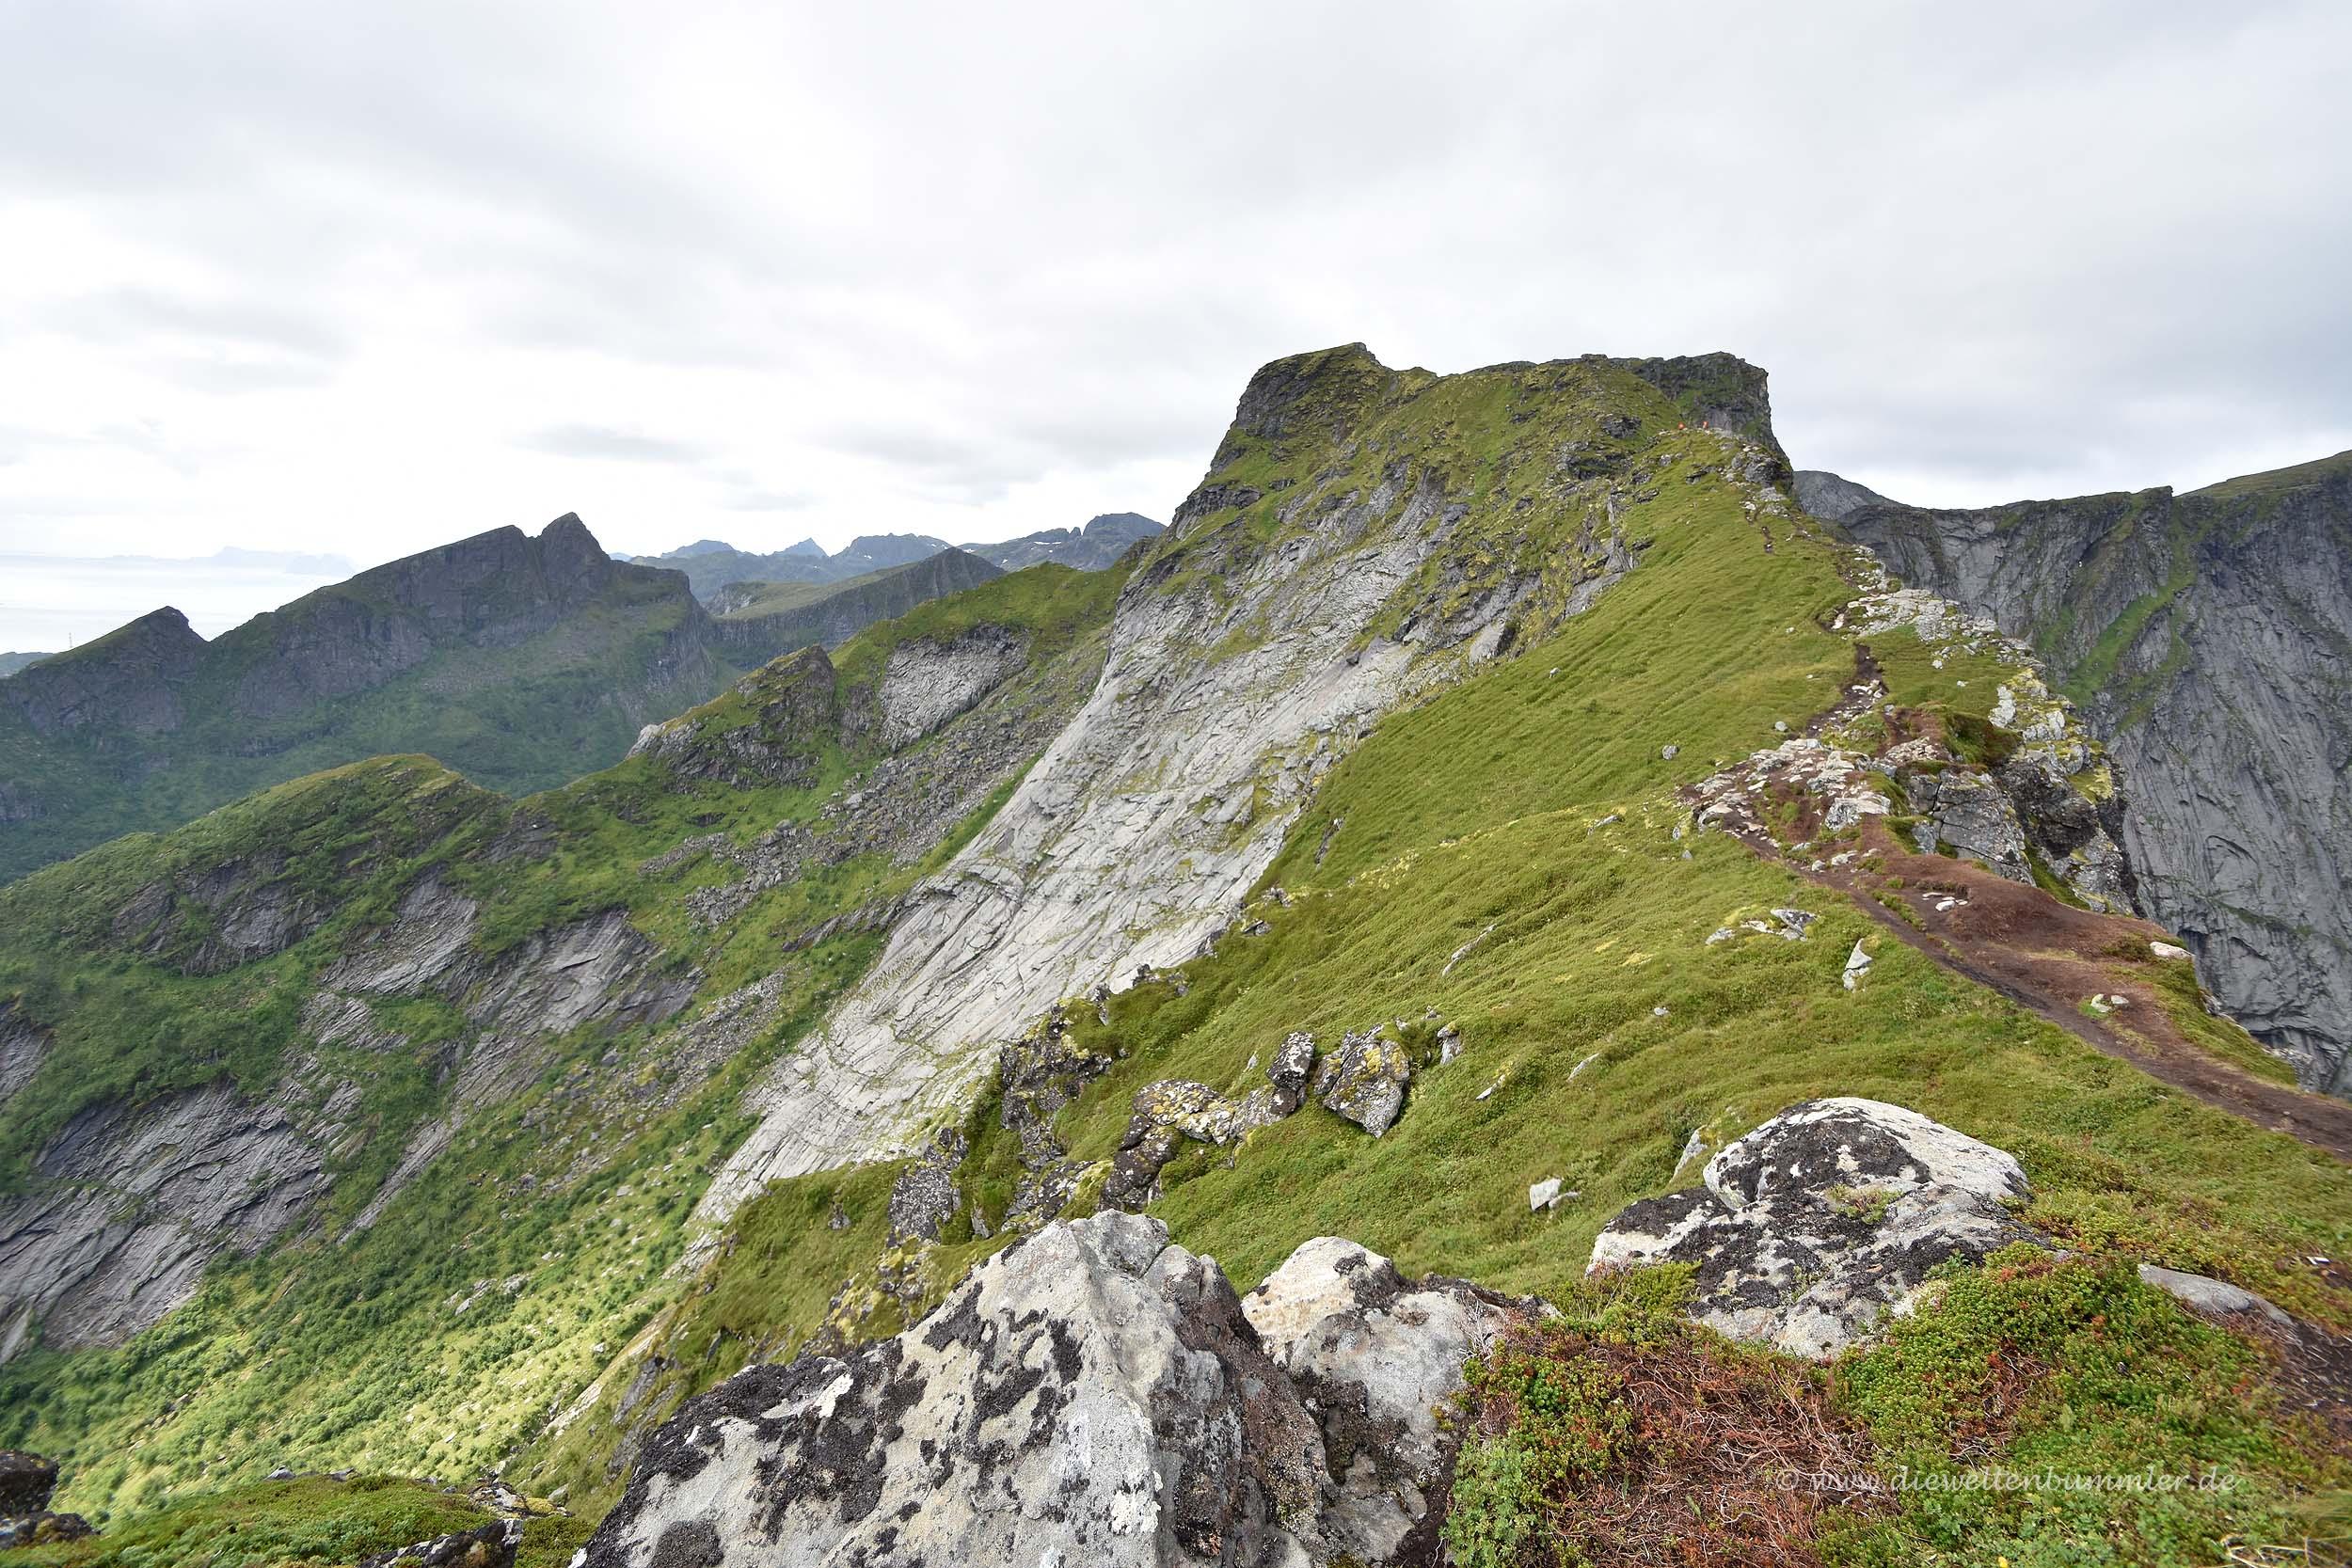 Blick über die anderen Gipfel